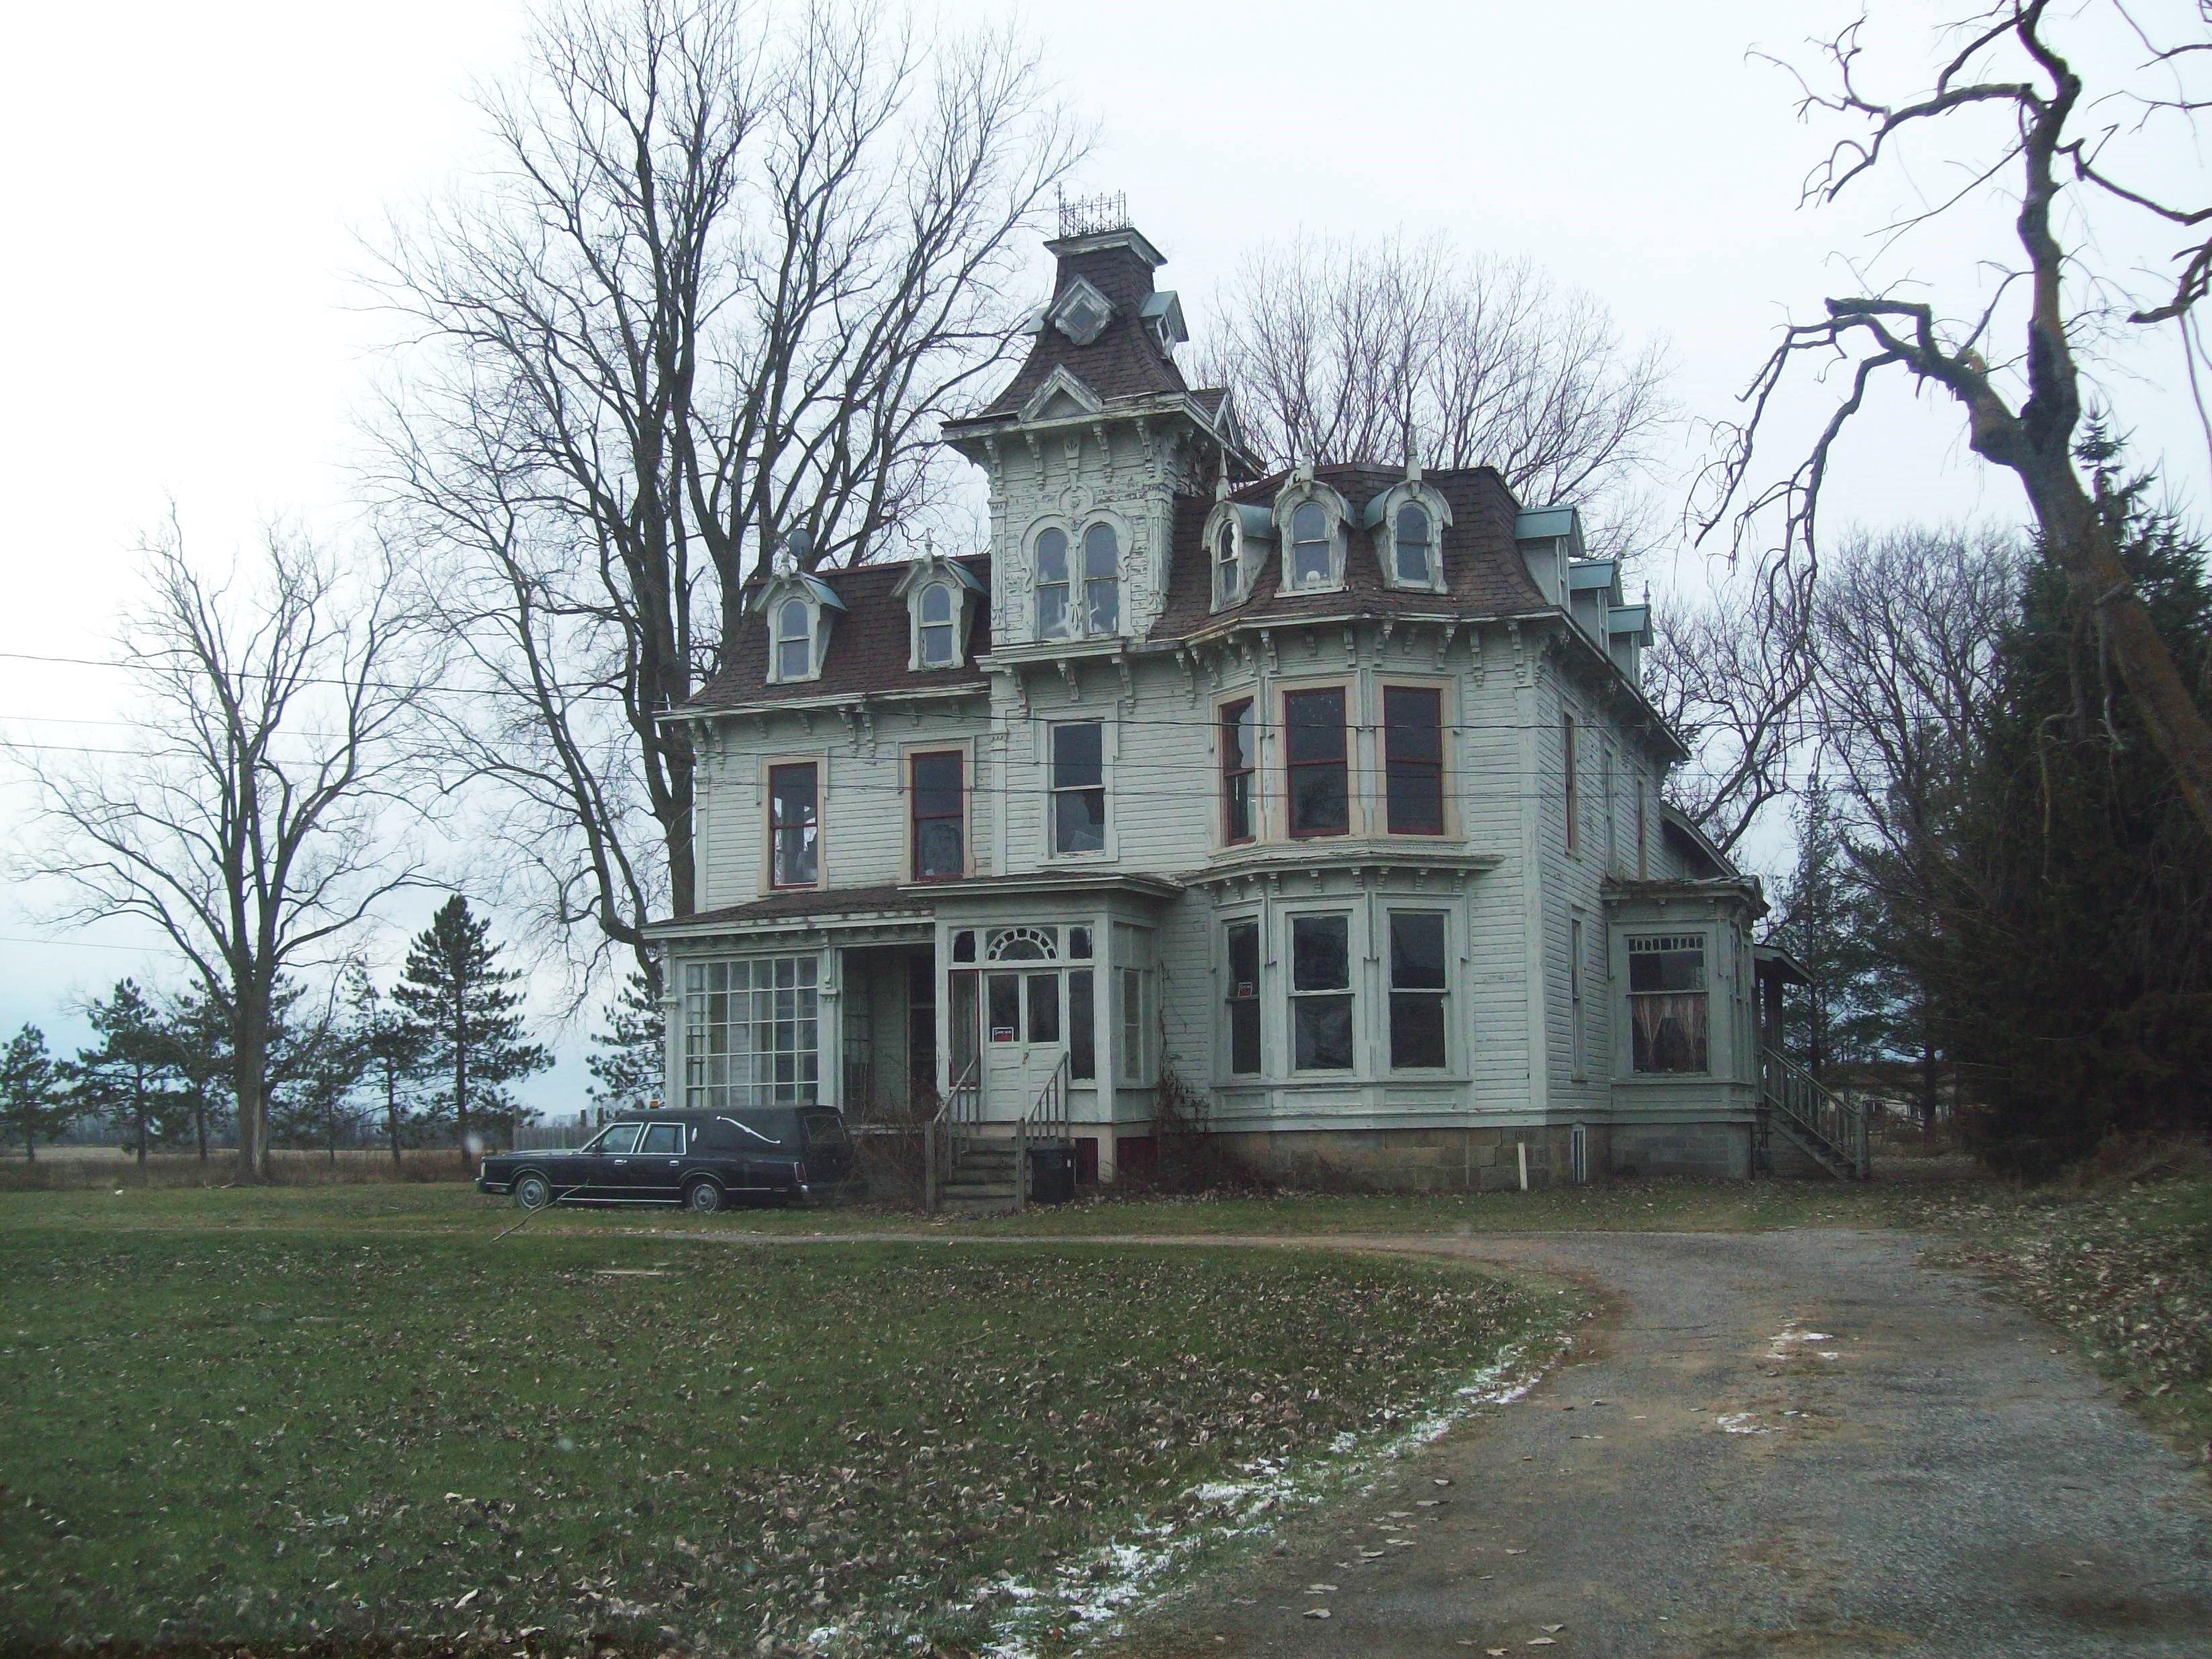 haunted house in michigan. haunted house in michigan   Pure Cottage Home   Pinterest